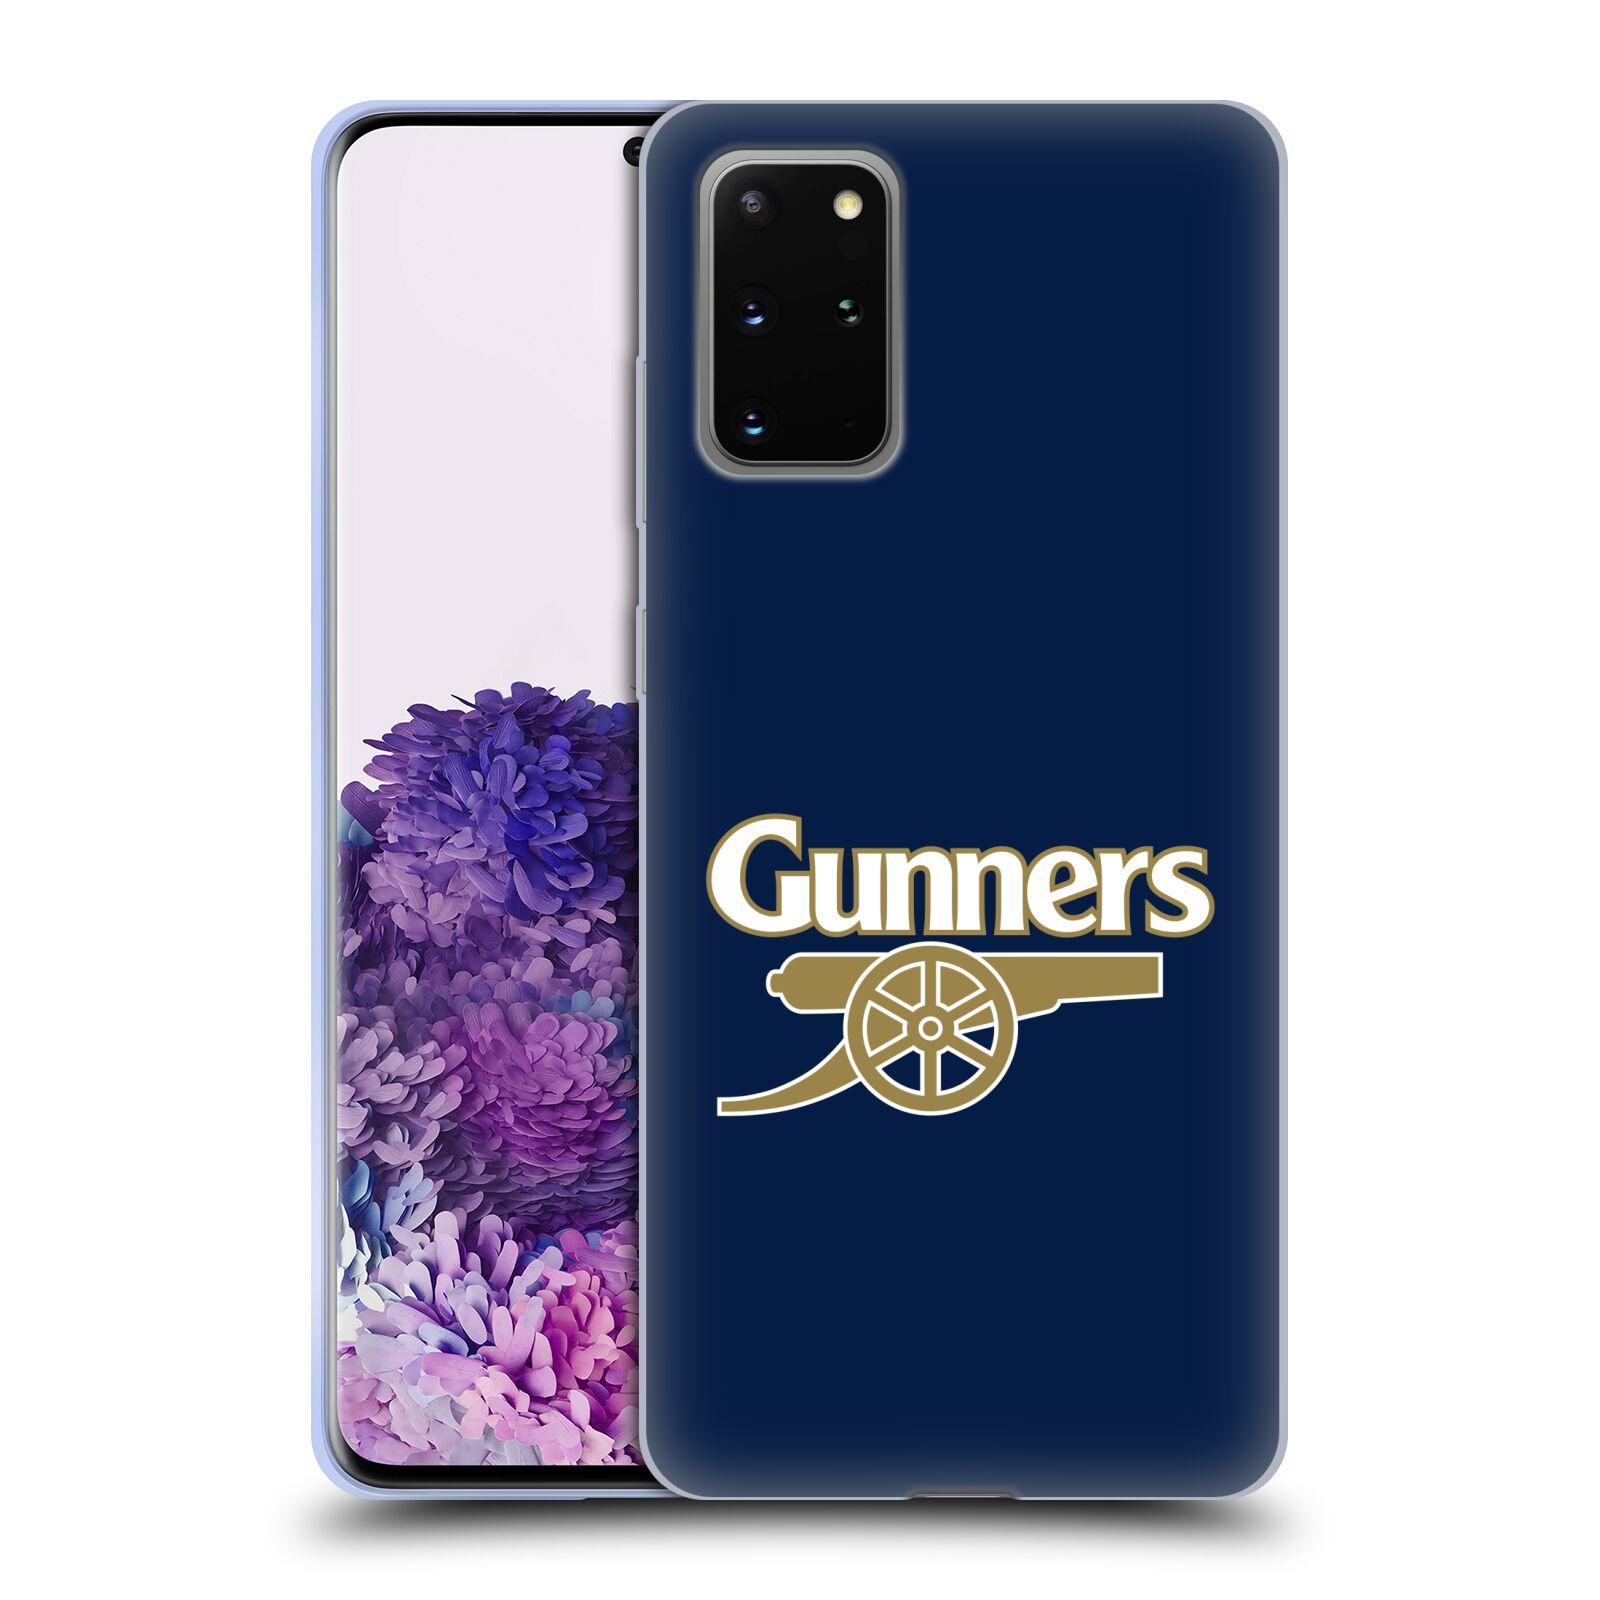 Silikonové pouzdro na mobil Samsung Galaxy S20 Plus - Head Case - Arsenal FC - Gunners